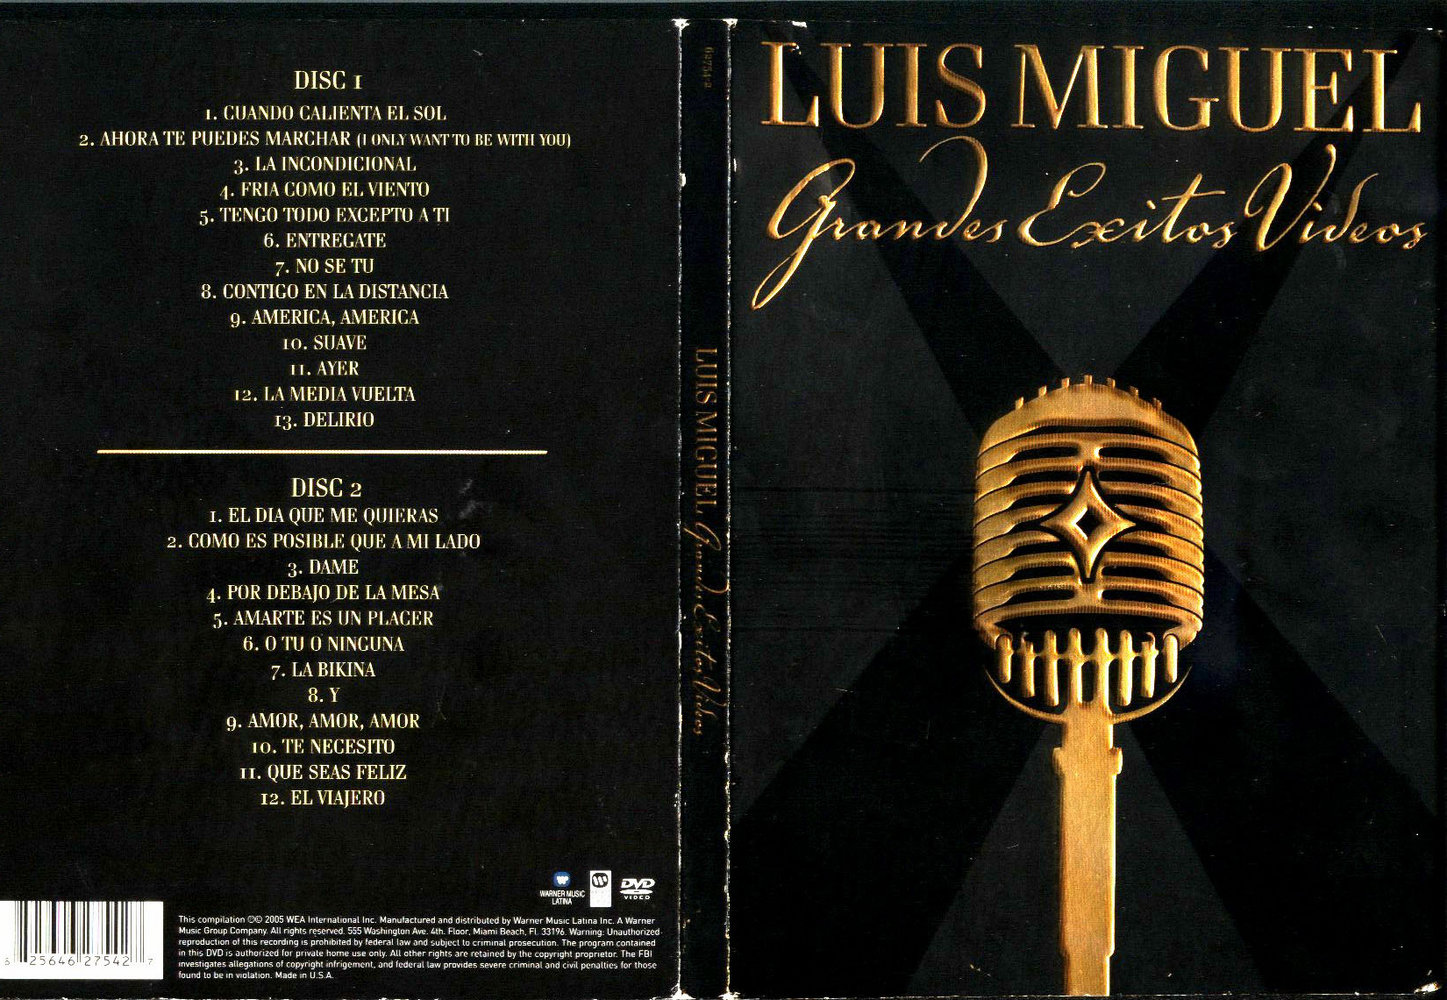 http://2.bp.blogspot.com/-JOrvFeuwGFI/Tf9FX4EP62I/AAAAAAAABJs/M-j6I3STI-w/s1600/Luis_Miguel_Grandes_Exitos_Videos-front.jpg